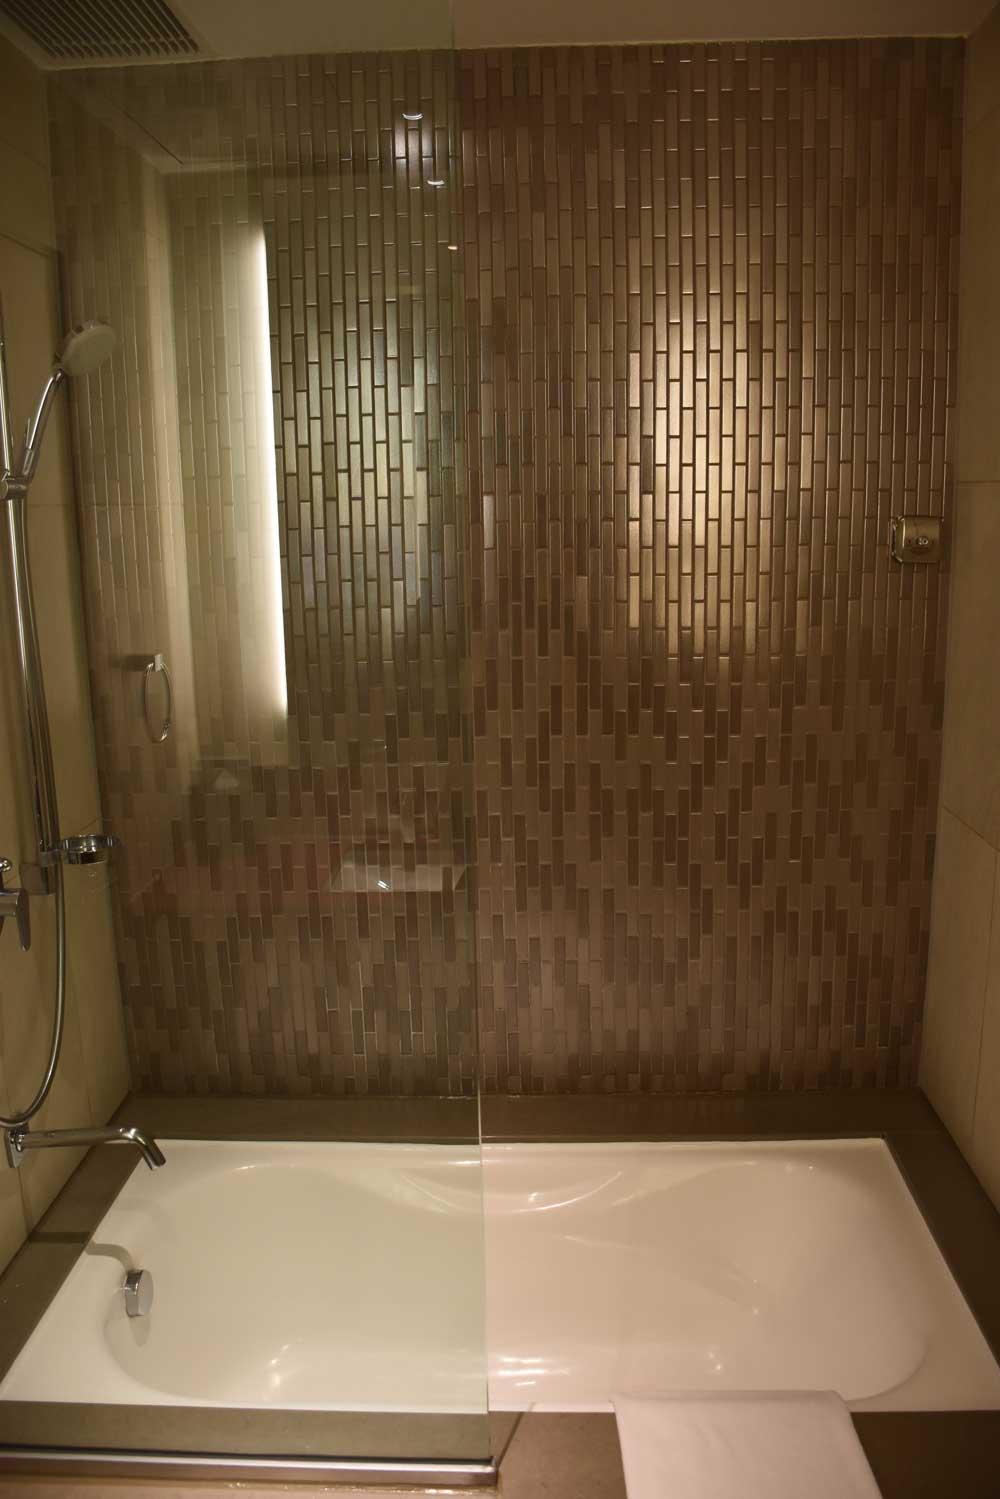 Countdown Hotel Standard King bathtub